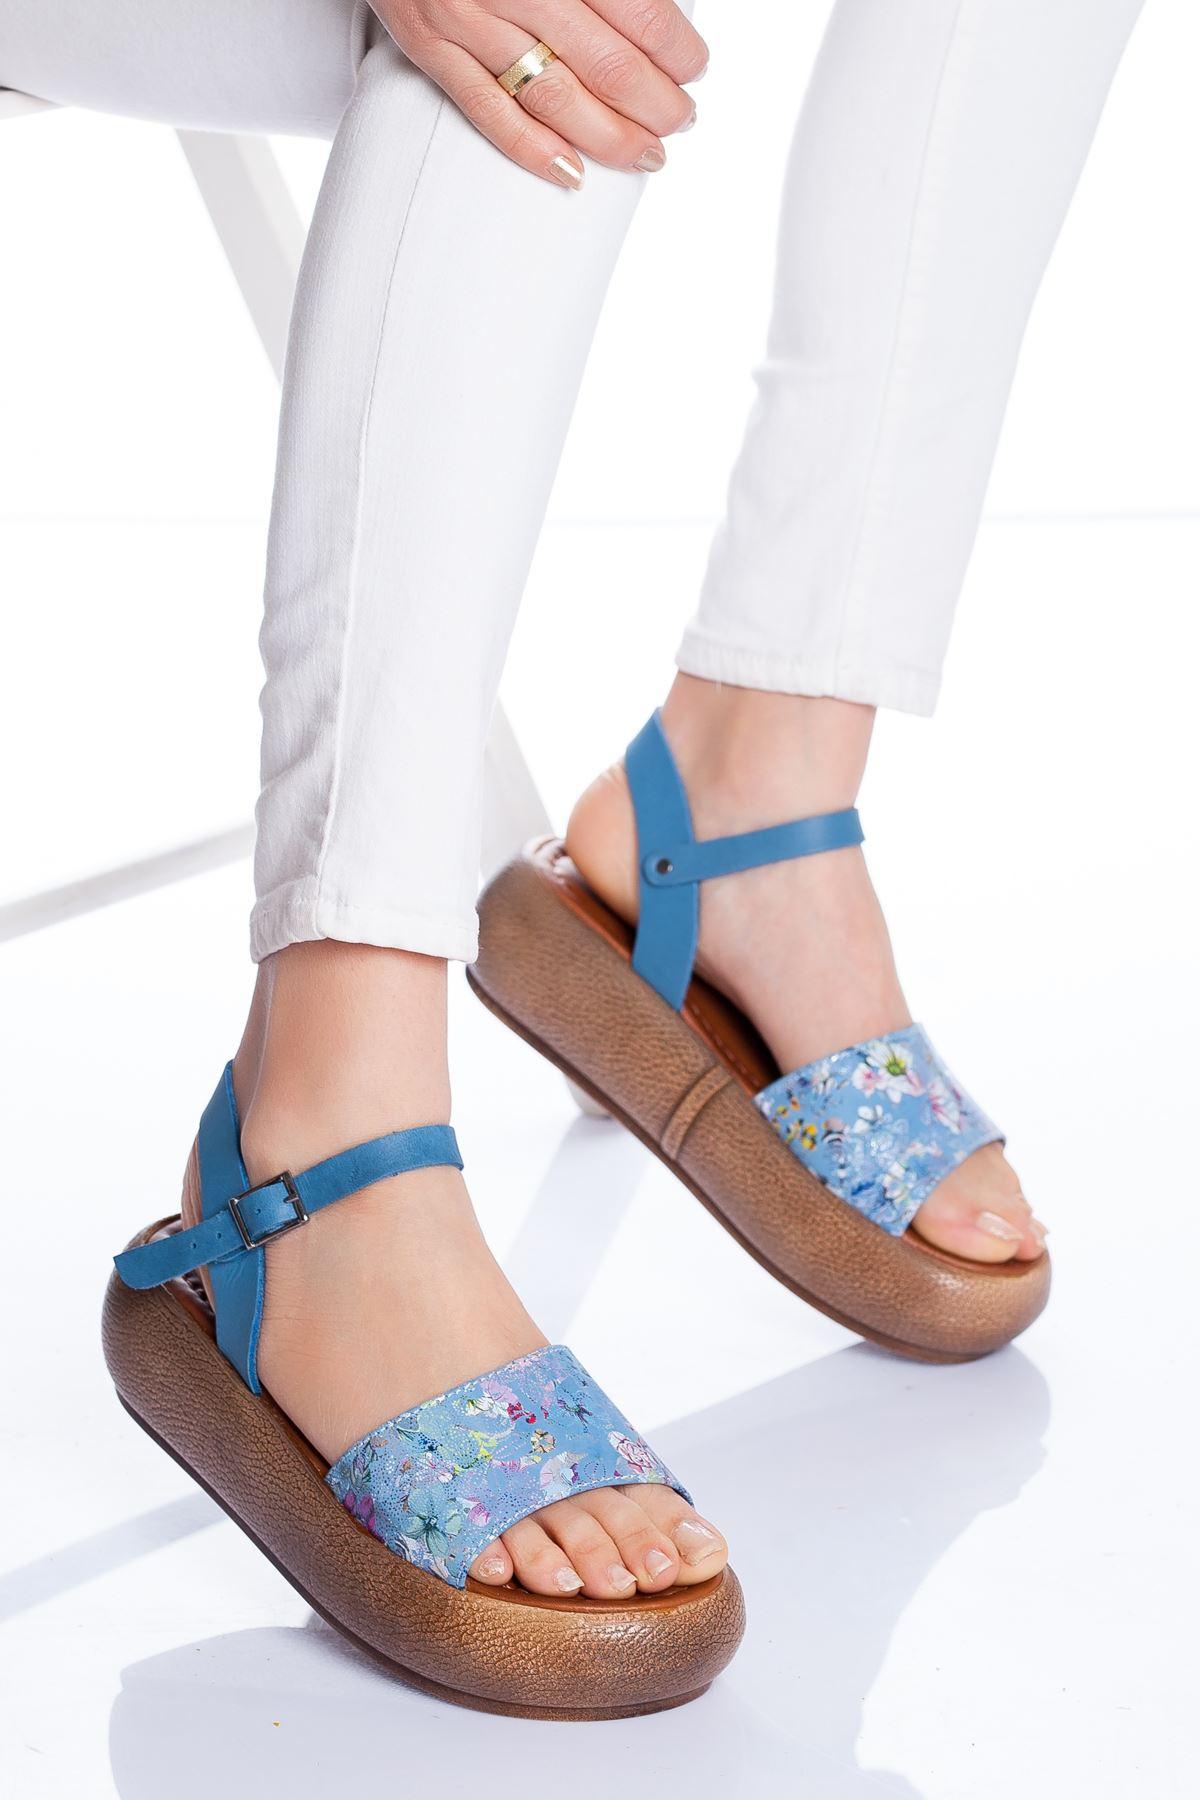 Lizy Deri Sandalet MAVİ